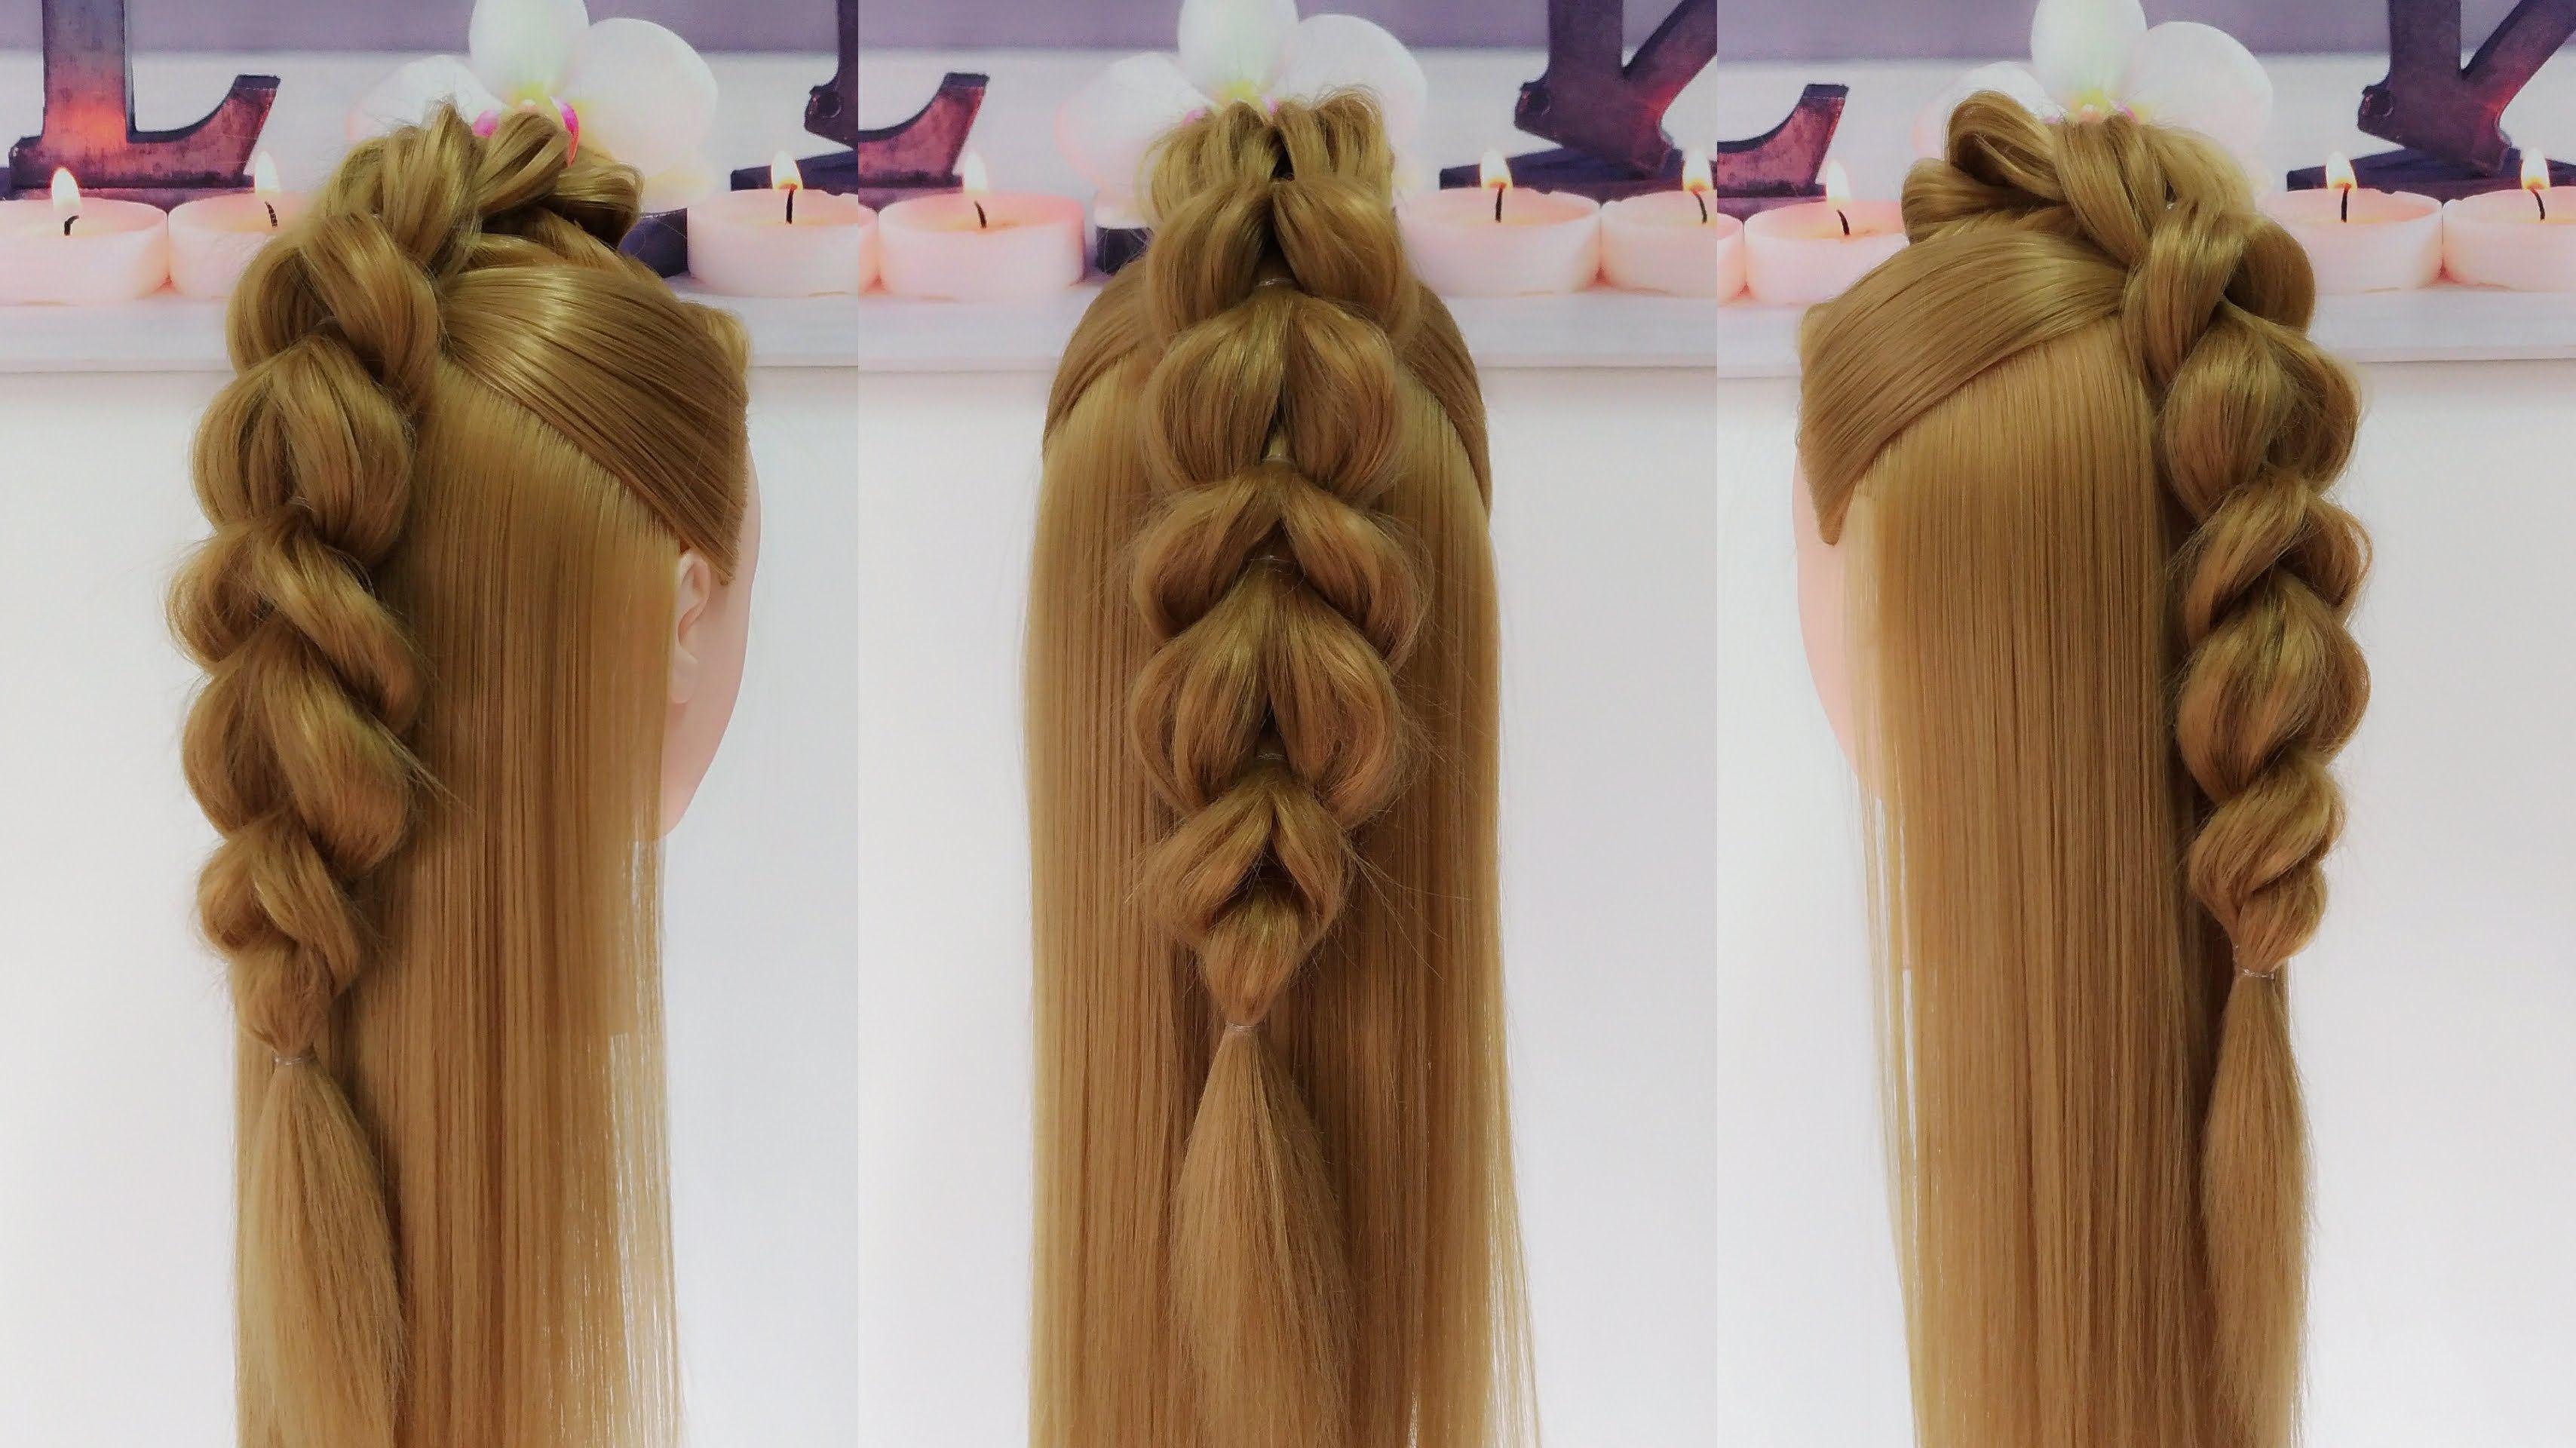 Сharming lagertha peinados Imagen de cortes de pelo consejos - Lagertha Vikings Peinado Vikingo con Trenza Eslabón ...